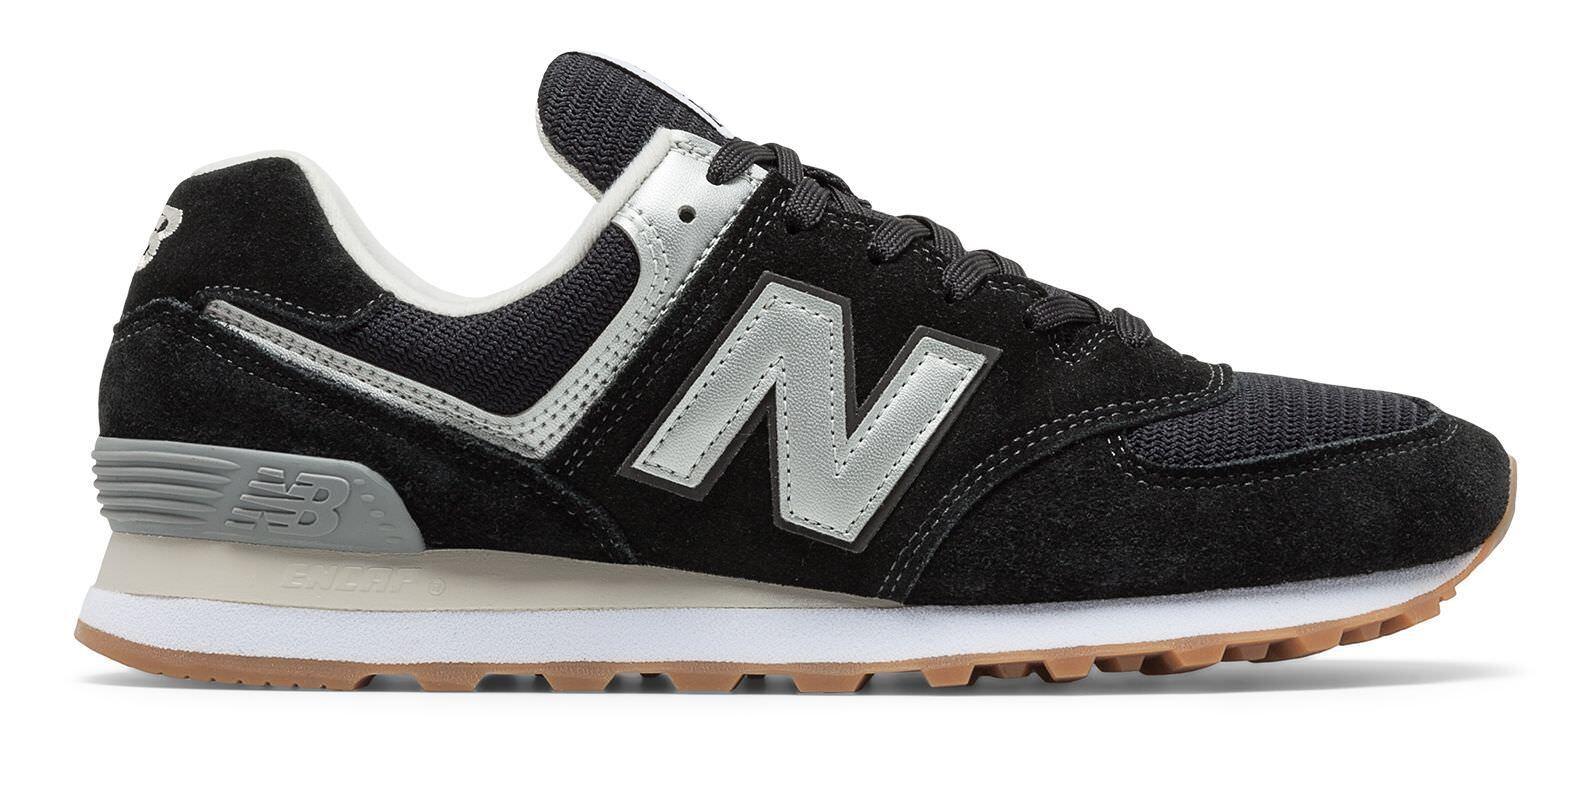 New Balance Homme 2018 Chaussures Noir